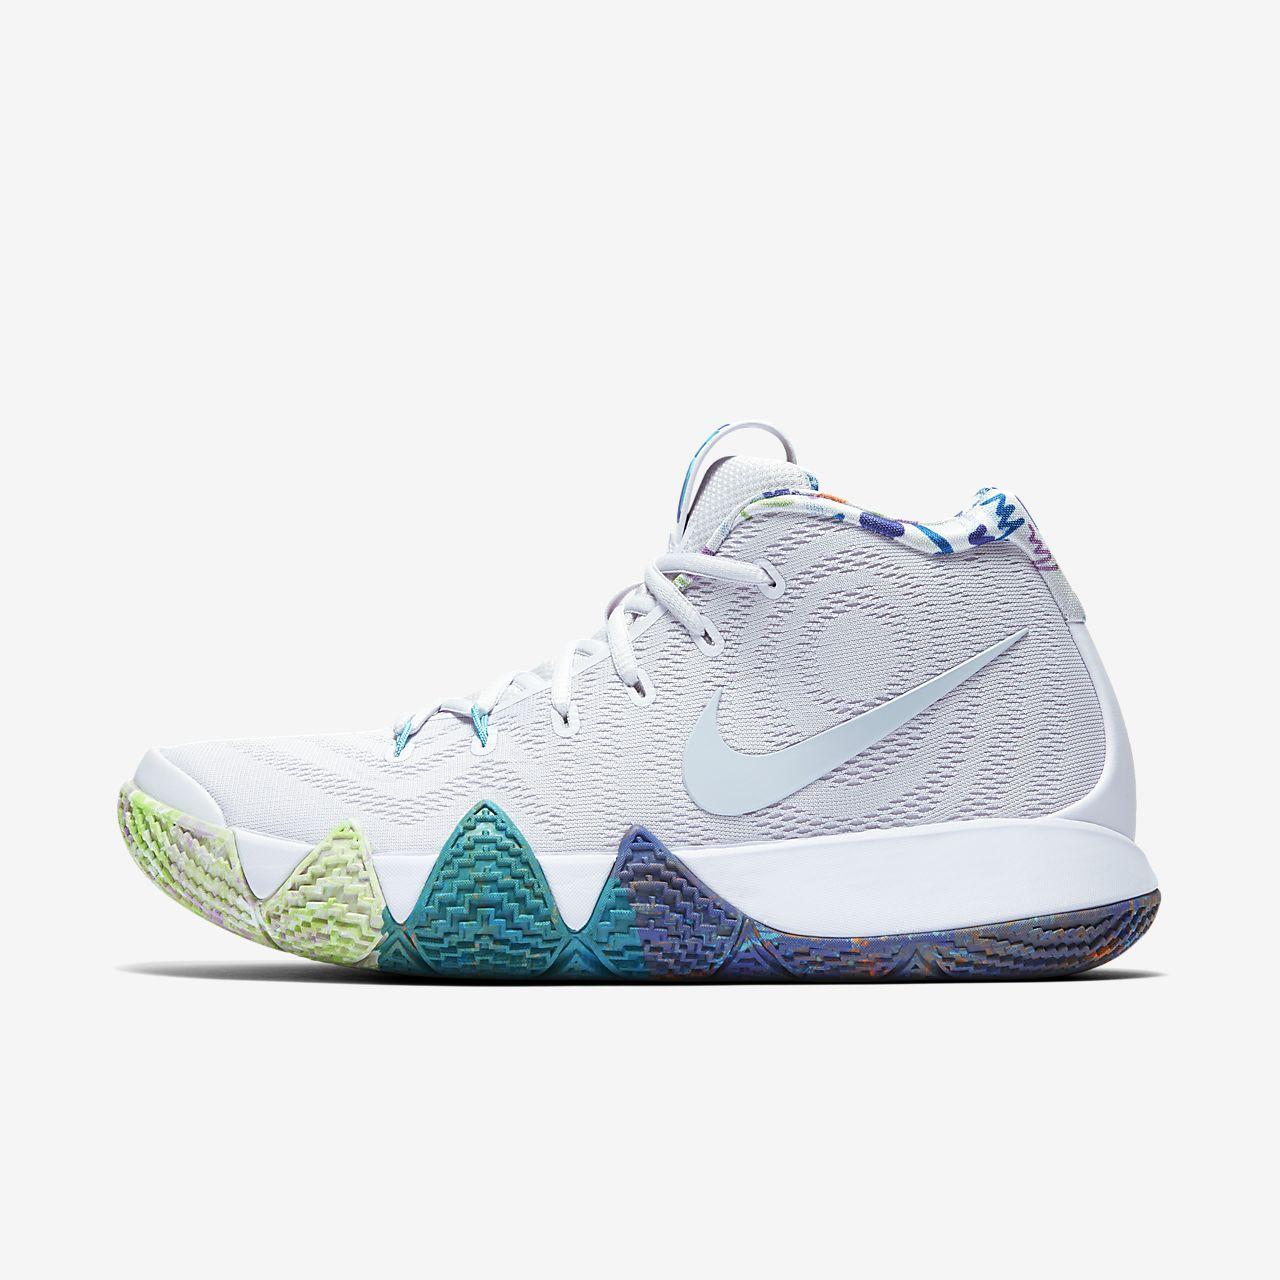 Nike S Basketball Shoes